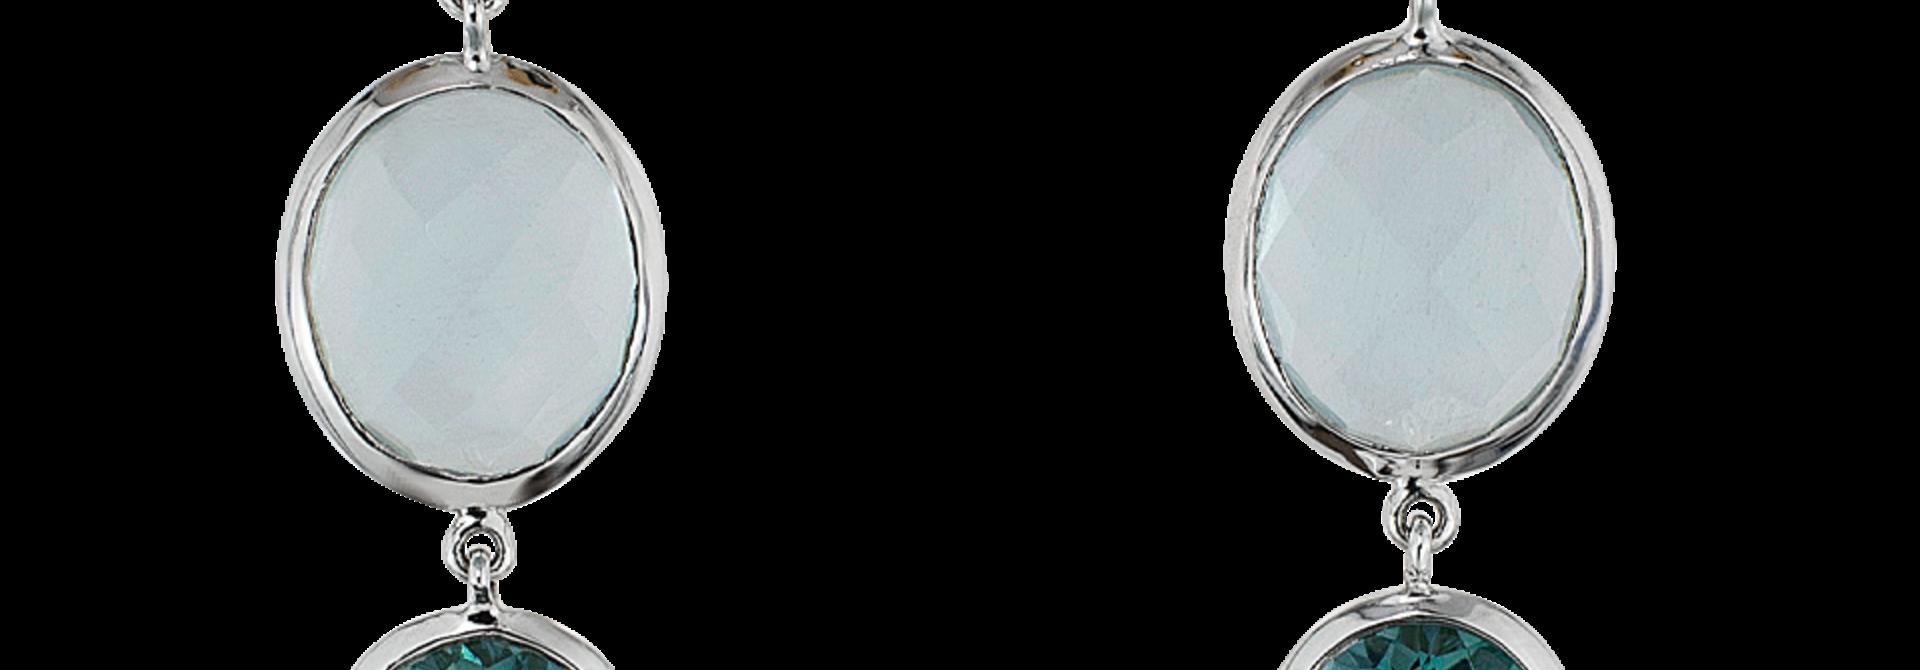 Aquamarine & Tourmaline Earrings